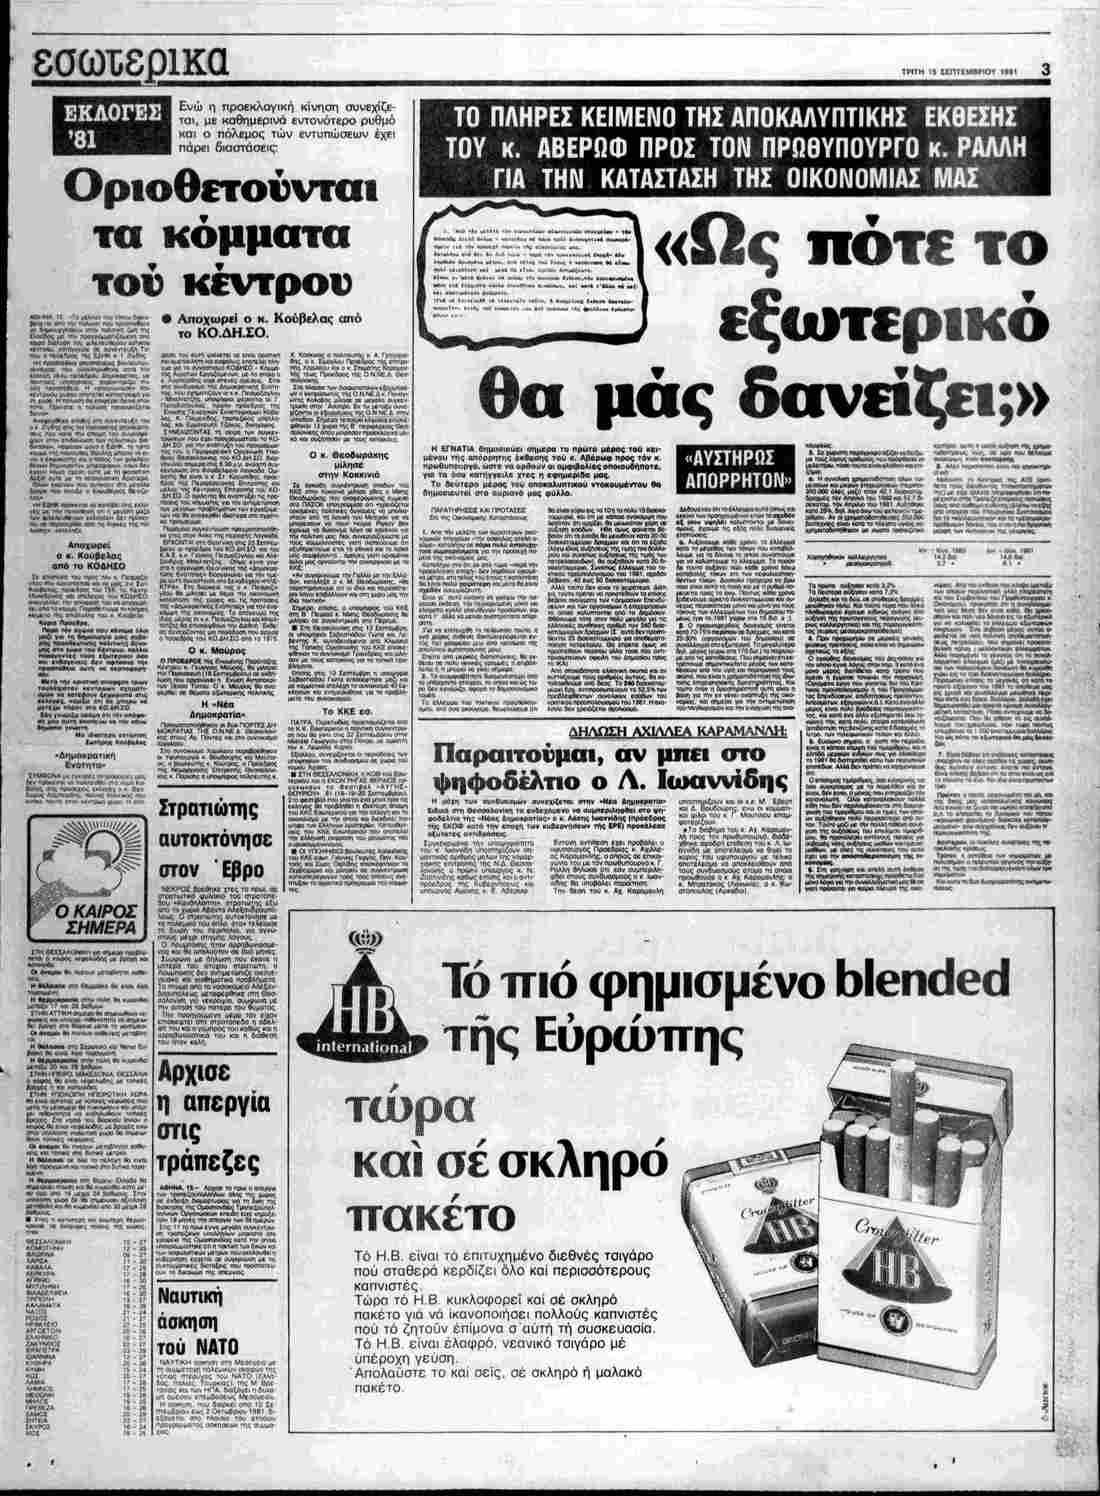 %CE%95%CE%93%CE%9D%CE%91%CE%A4%CE%99%CE%91-15-09-1981-0336 Λαλιώτης: Πώς ο Κερδοσκόπος Σόρος έχασε από τον Ανδρέα Παπανδρέου